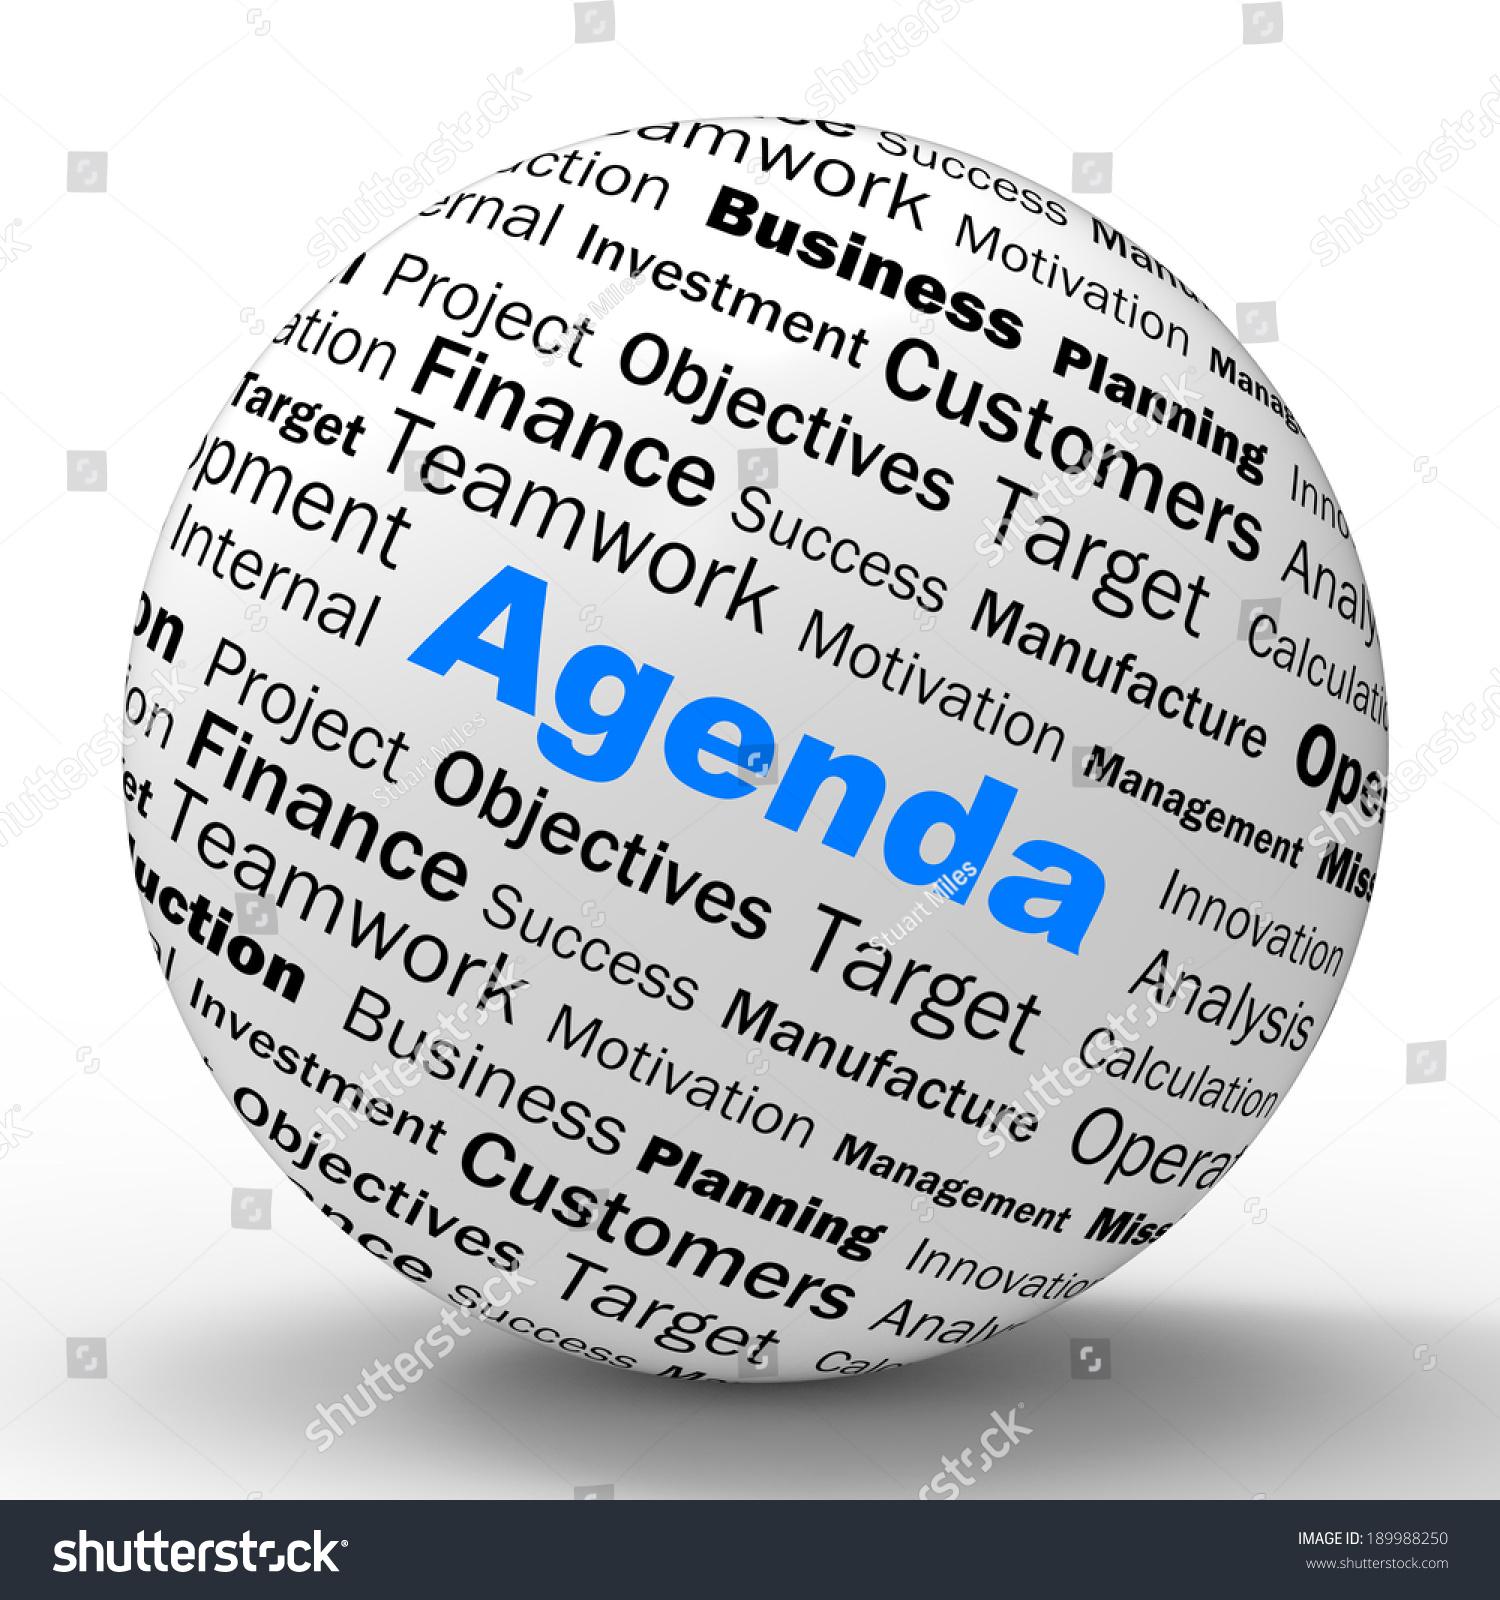 Agenda Sphere Definition Meaning Schedule Planner Arrangement Or Reminder Stock Photo 189988250 : Shutterstock